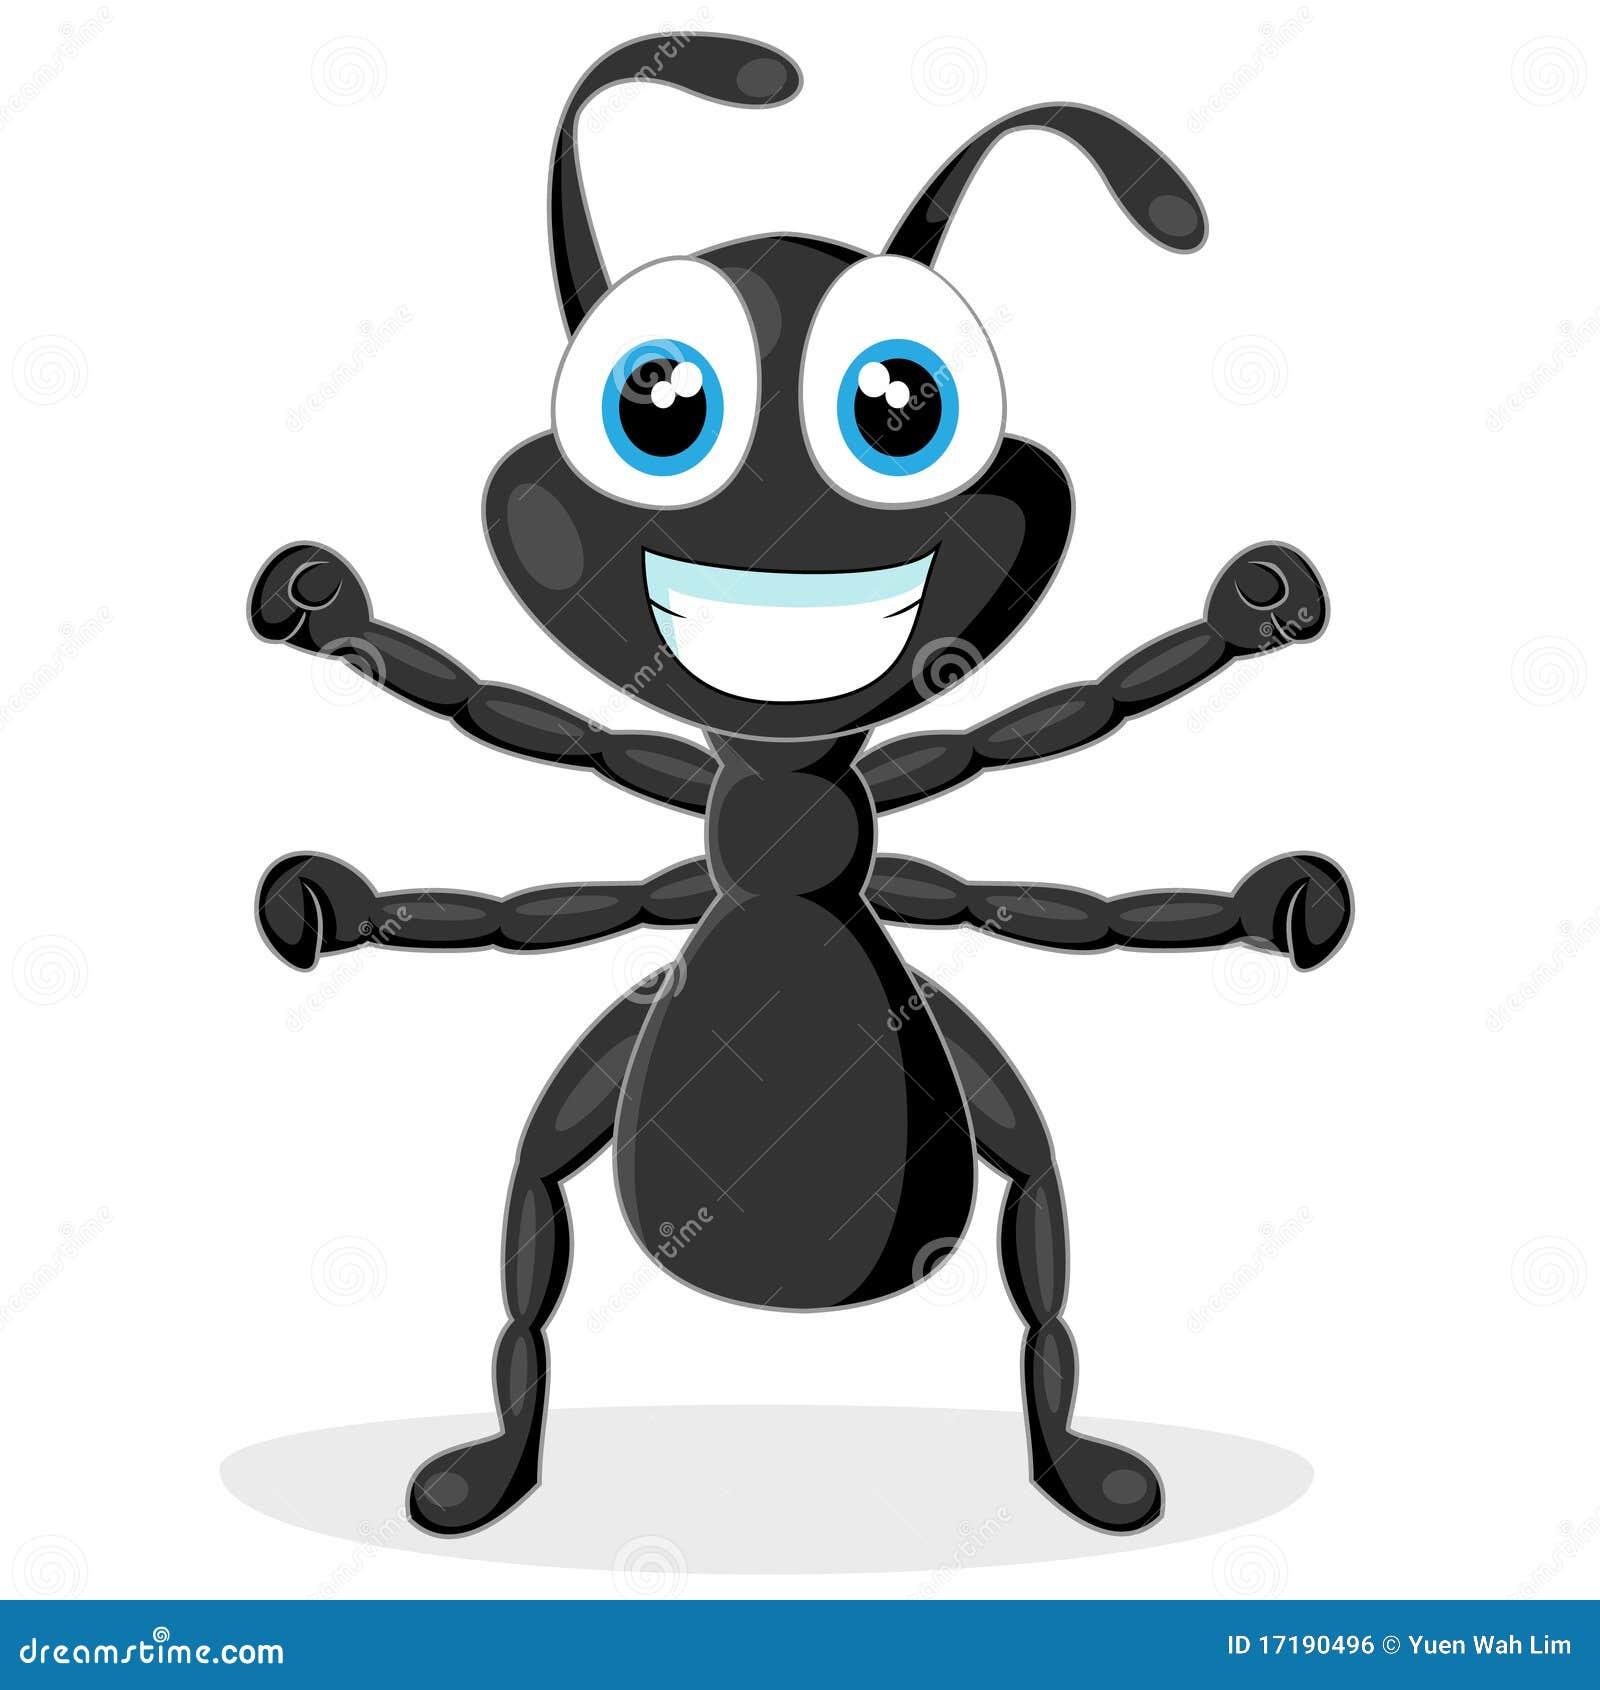 Cartoon black ants - photo#8